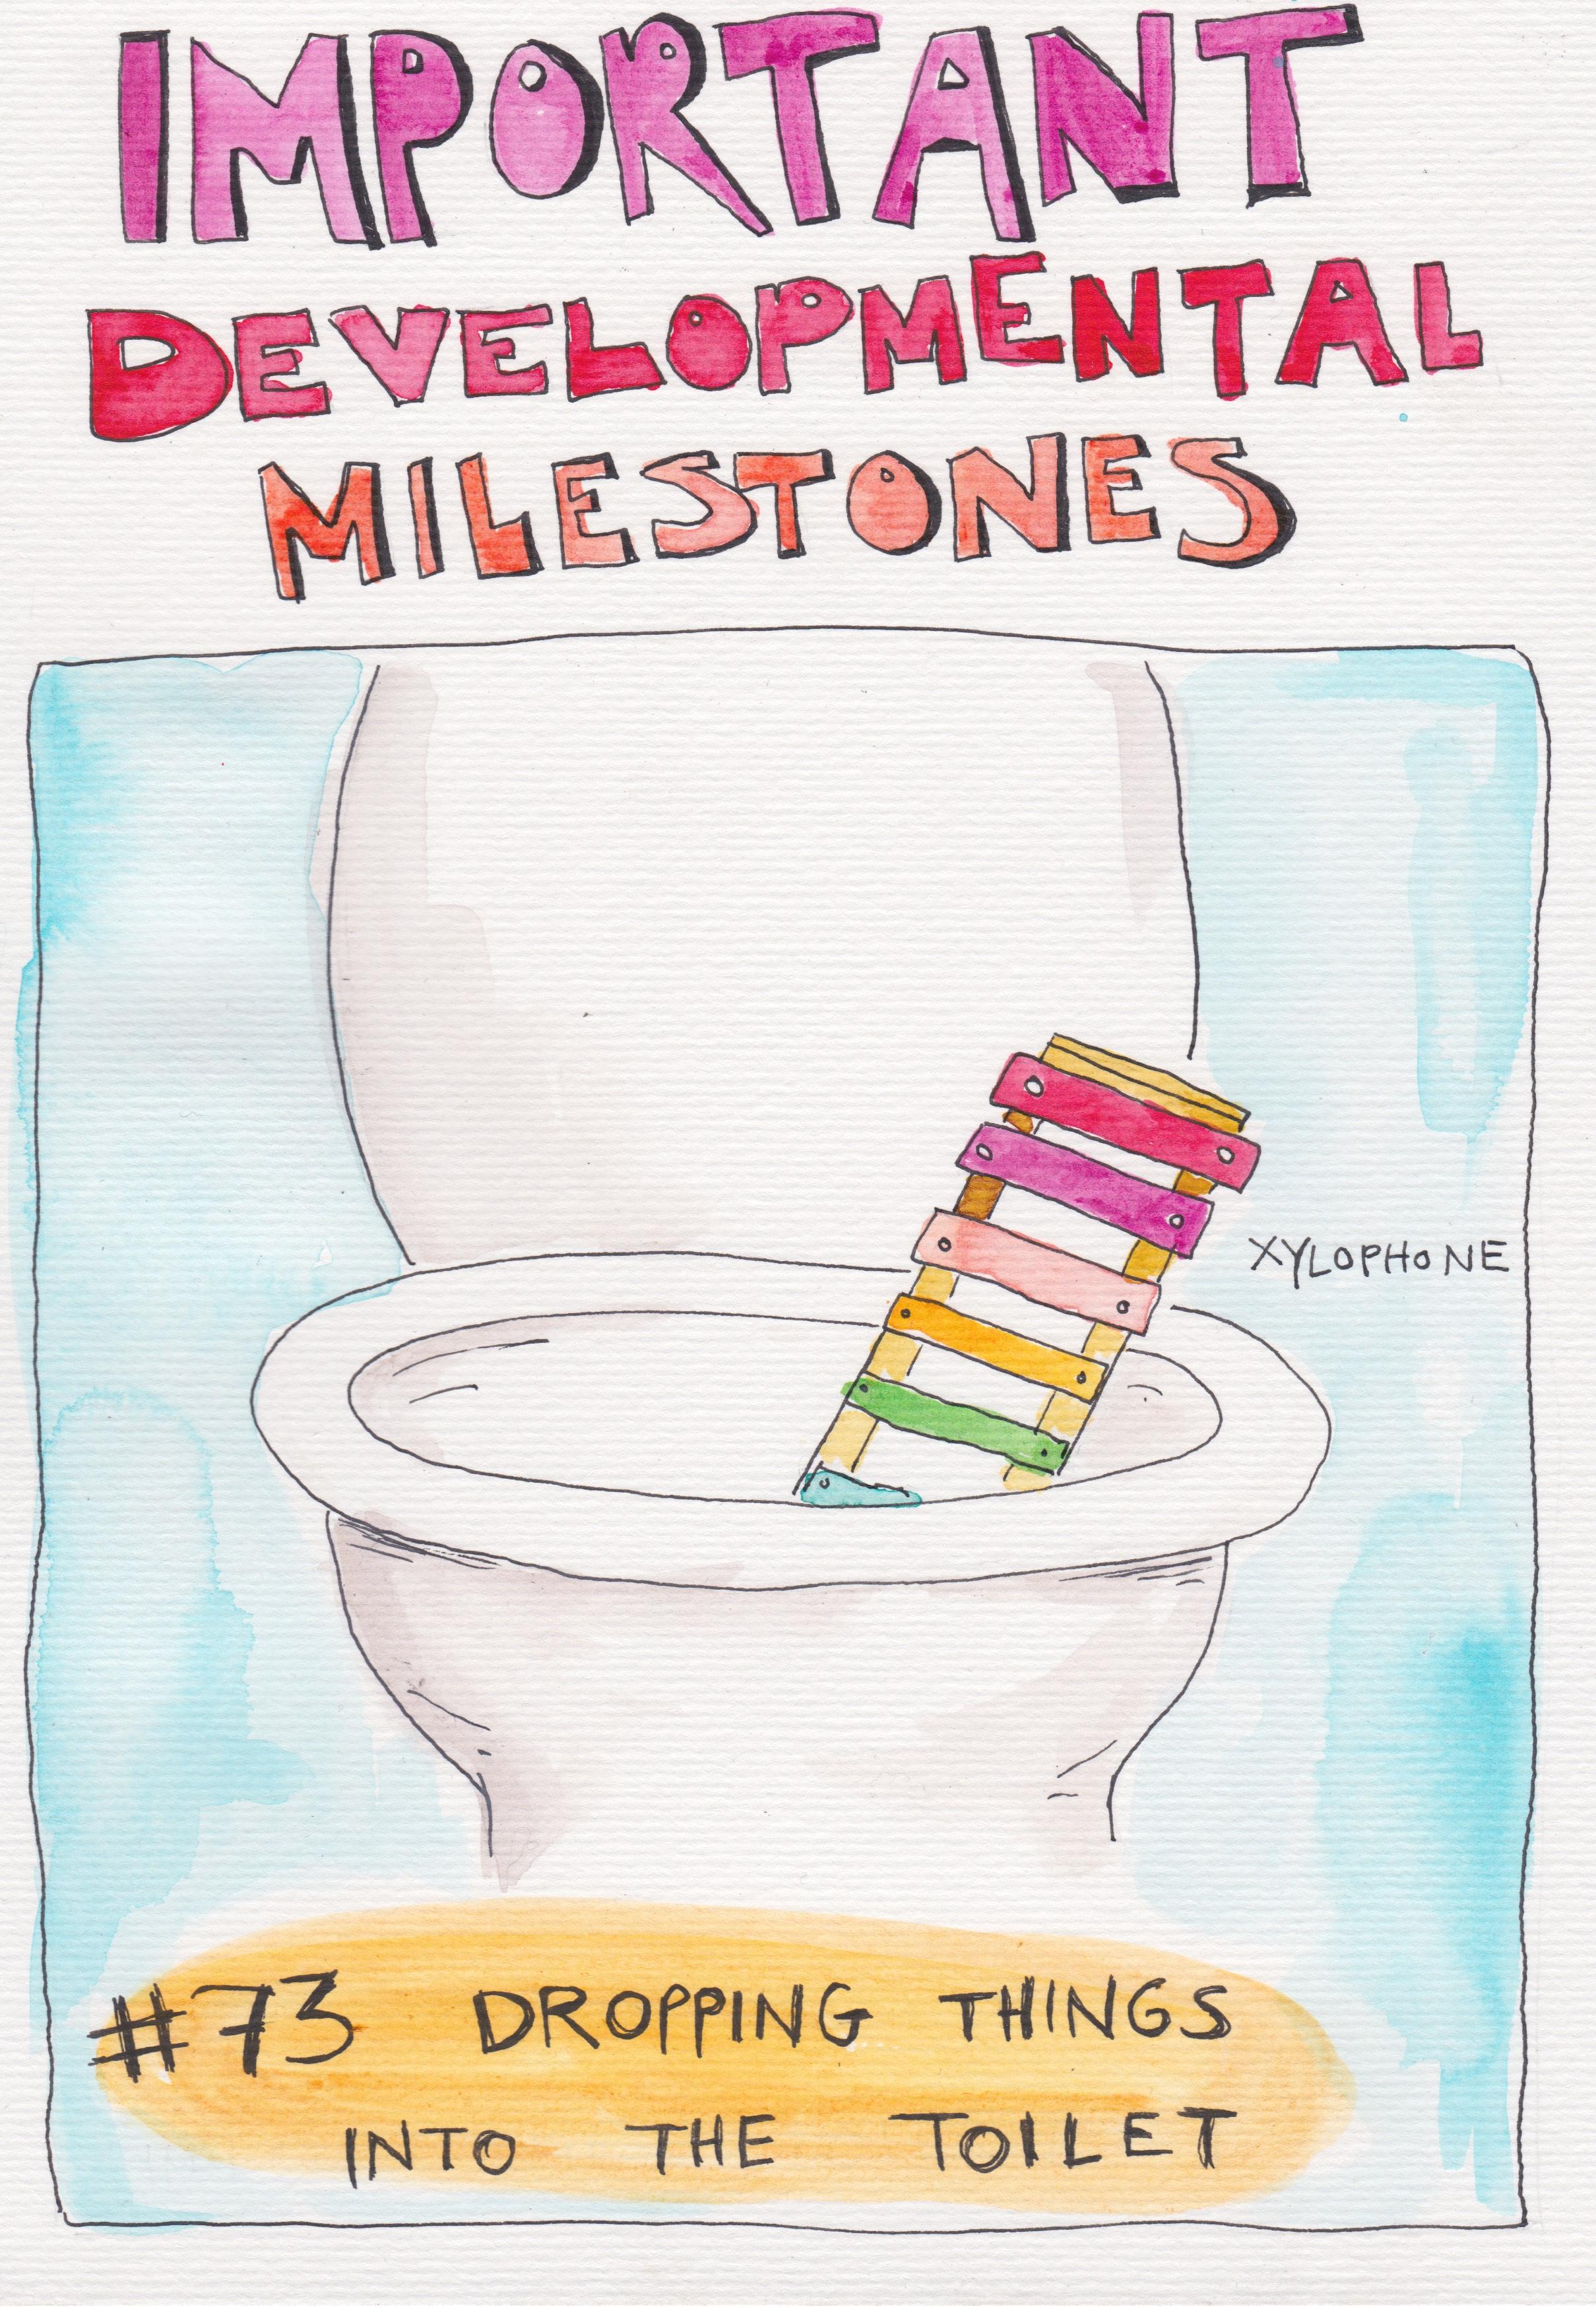 Developmental milestones.jpg